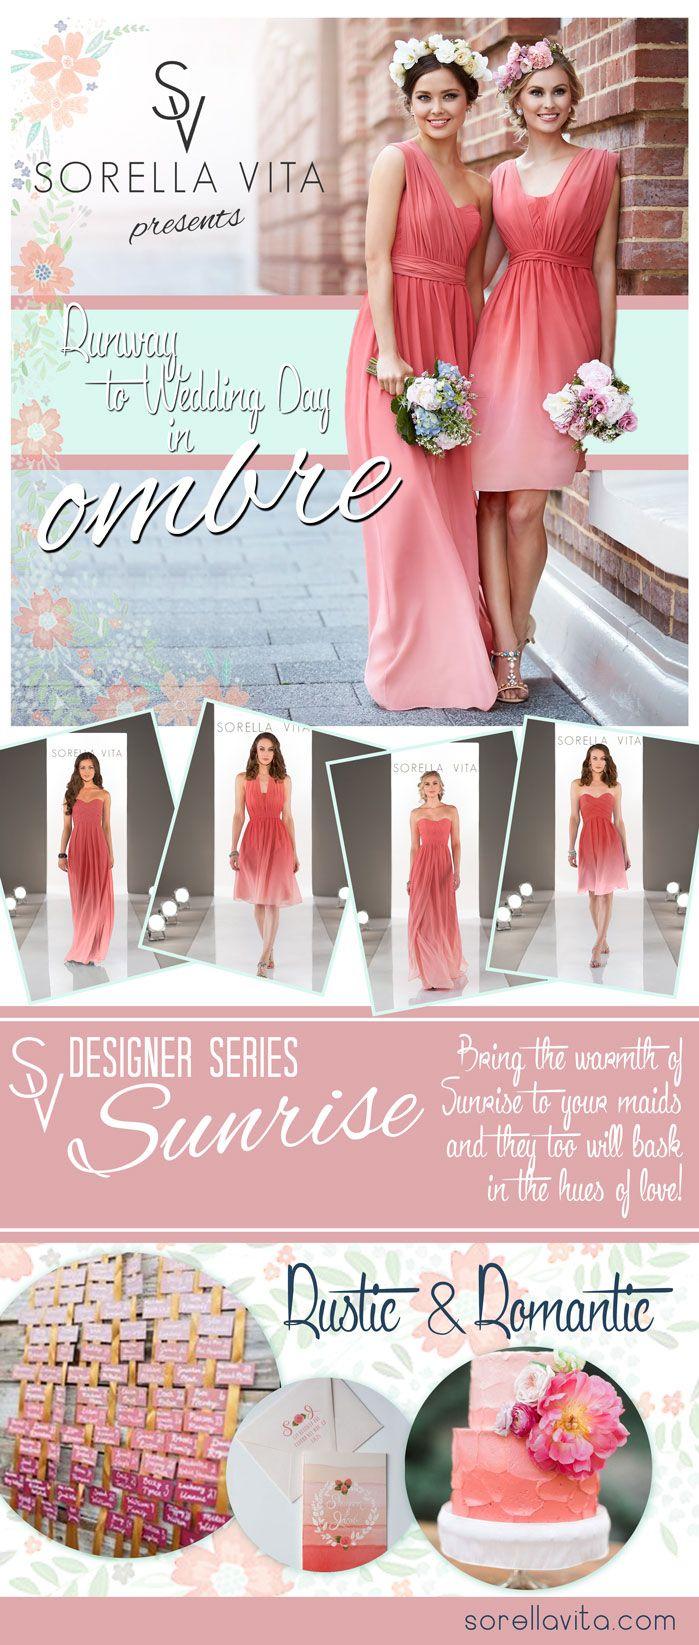 12 best ambre wedding images on Pinterest | Ombre bridesmaid dresses ...